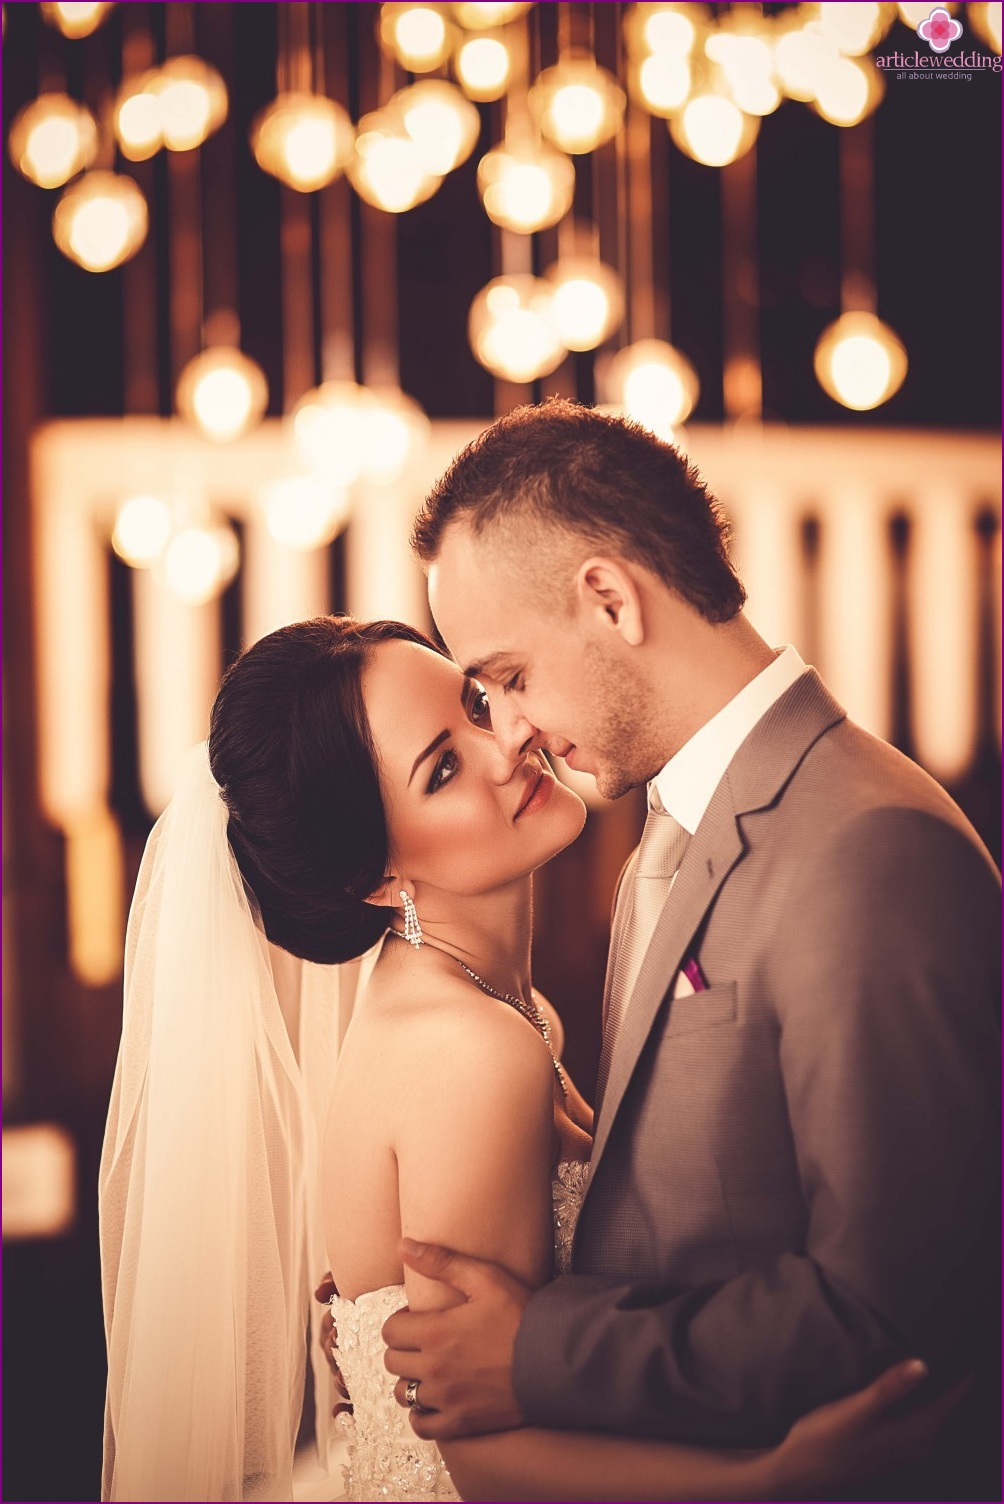 Wedding anniversary photography